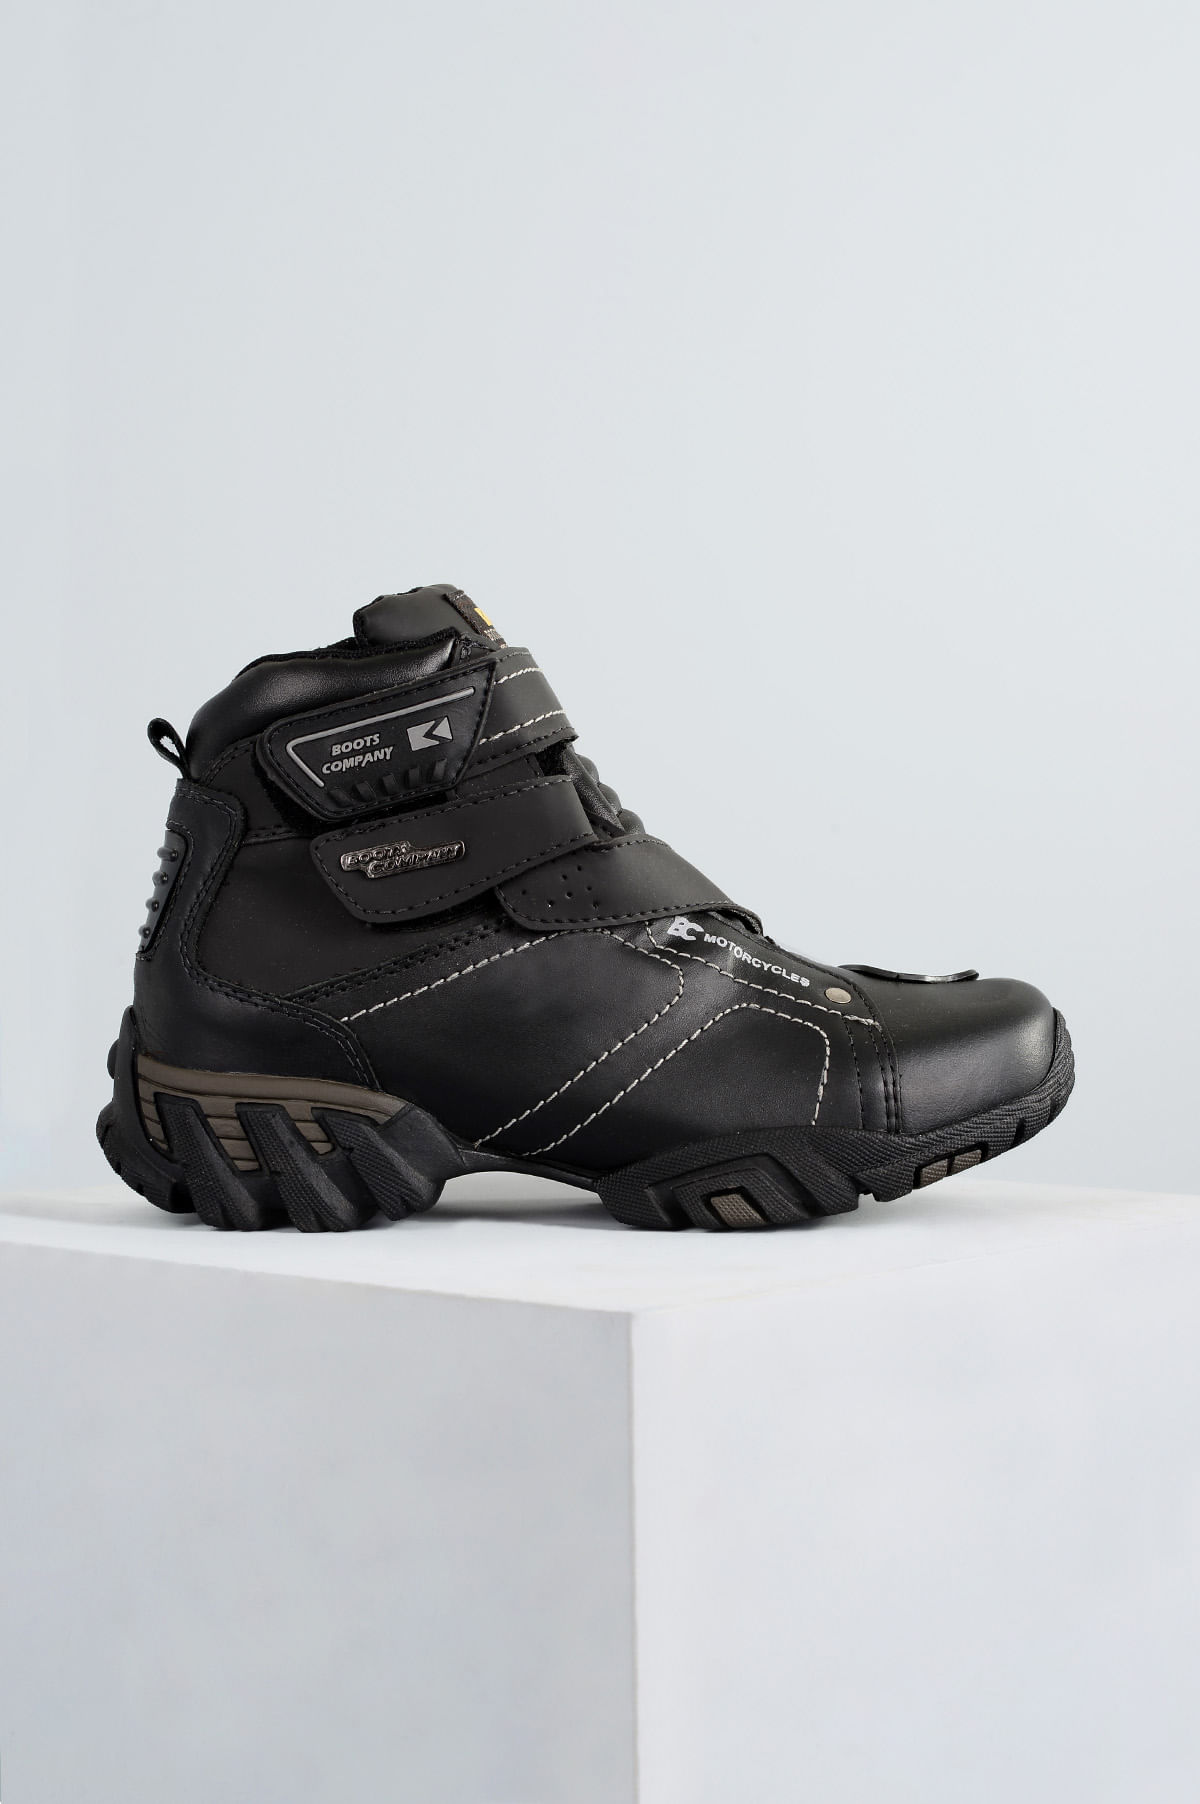 3ecd5dd70f4 Bota Masculina Boots Company Ducatys CR-PRETO - Mundial Calçados